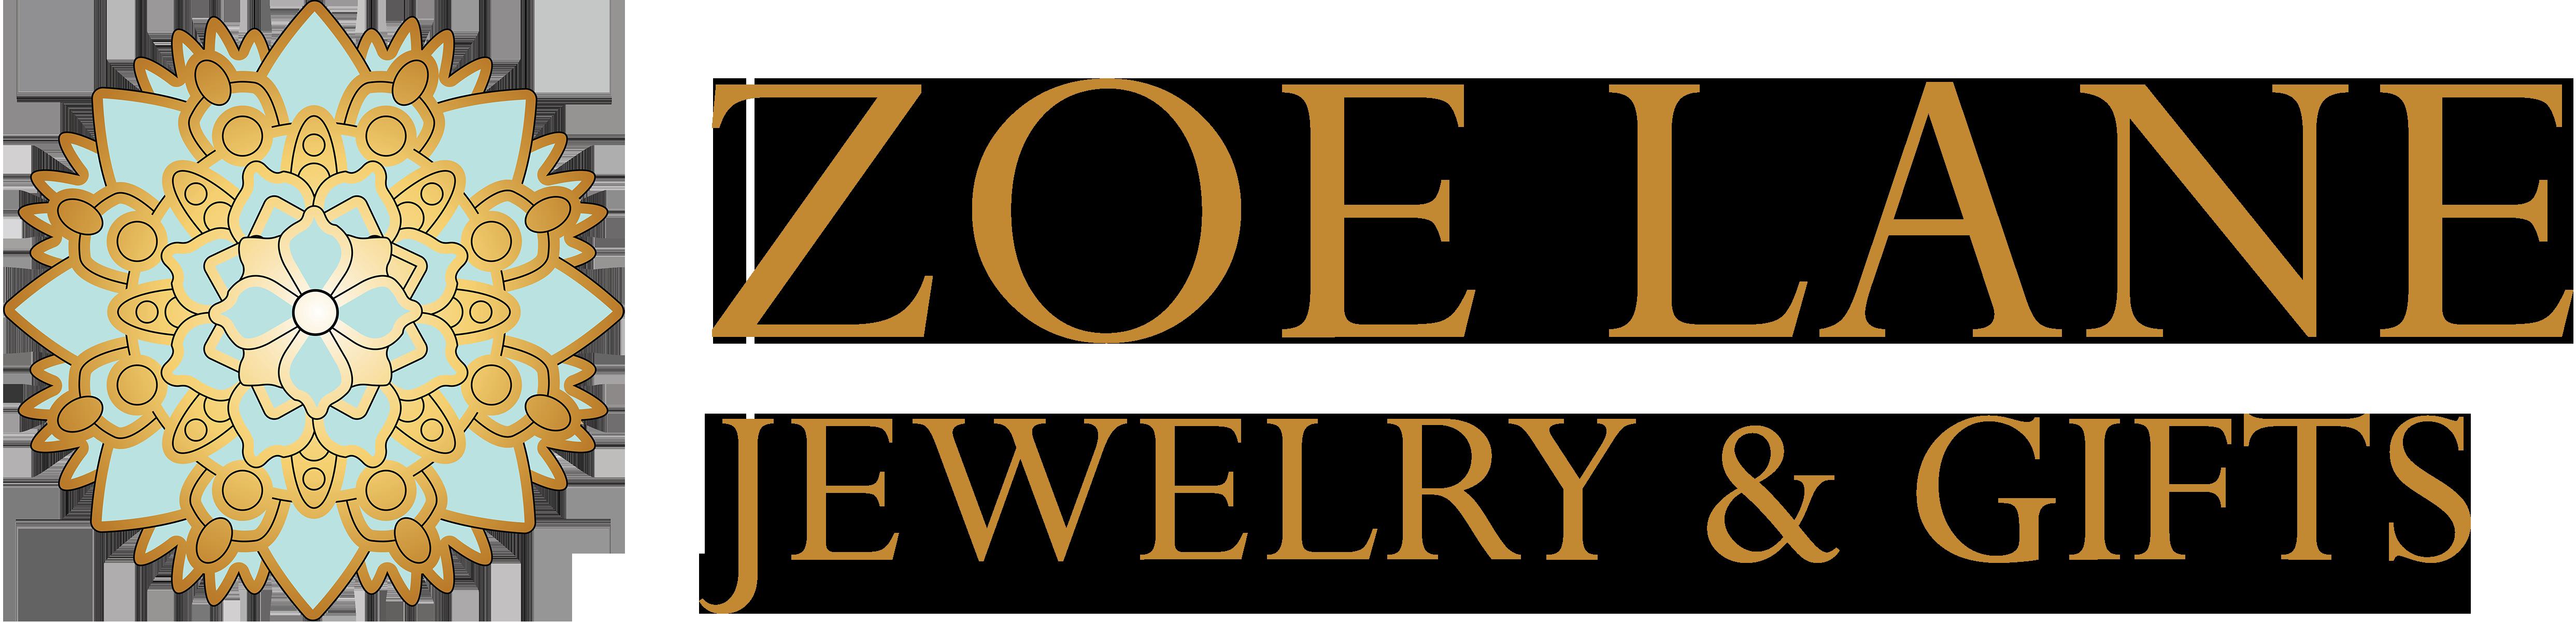 Zoe Lane Jewelry -